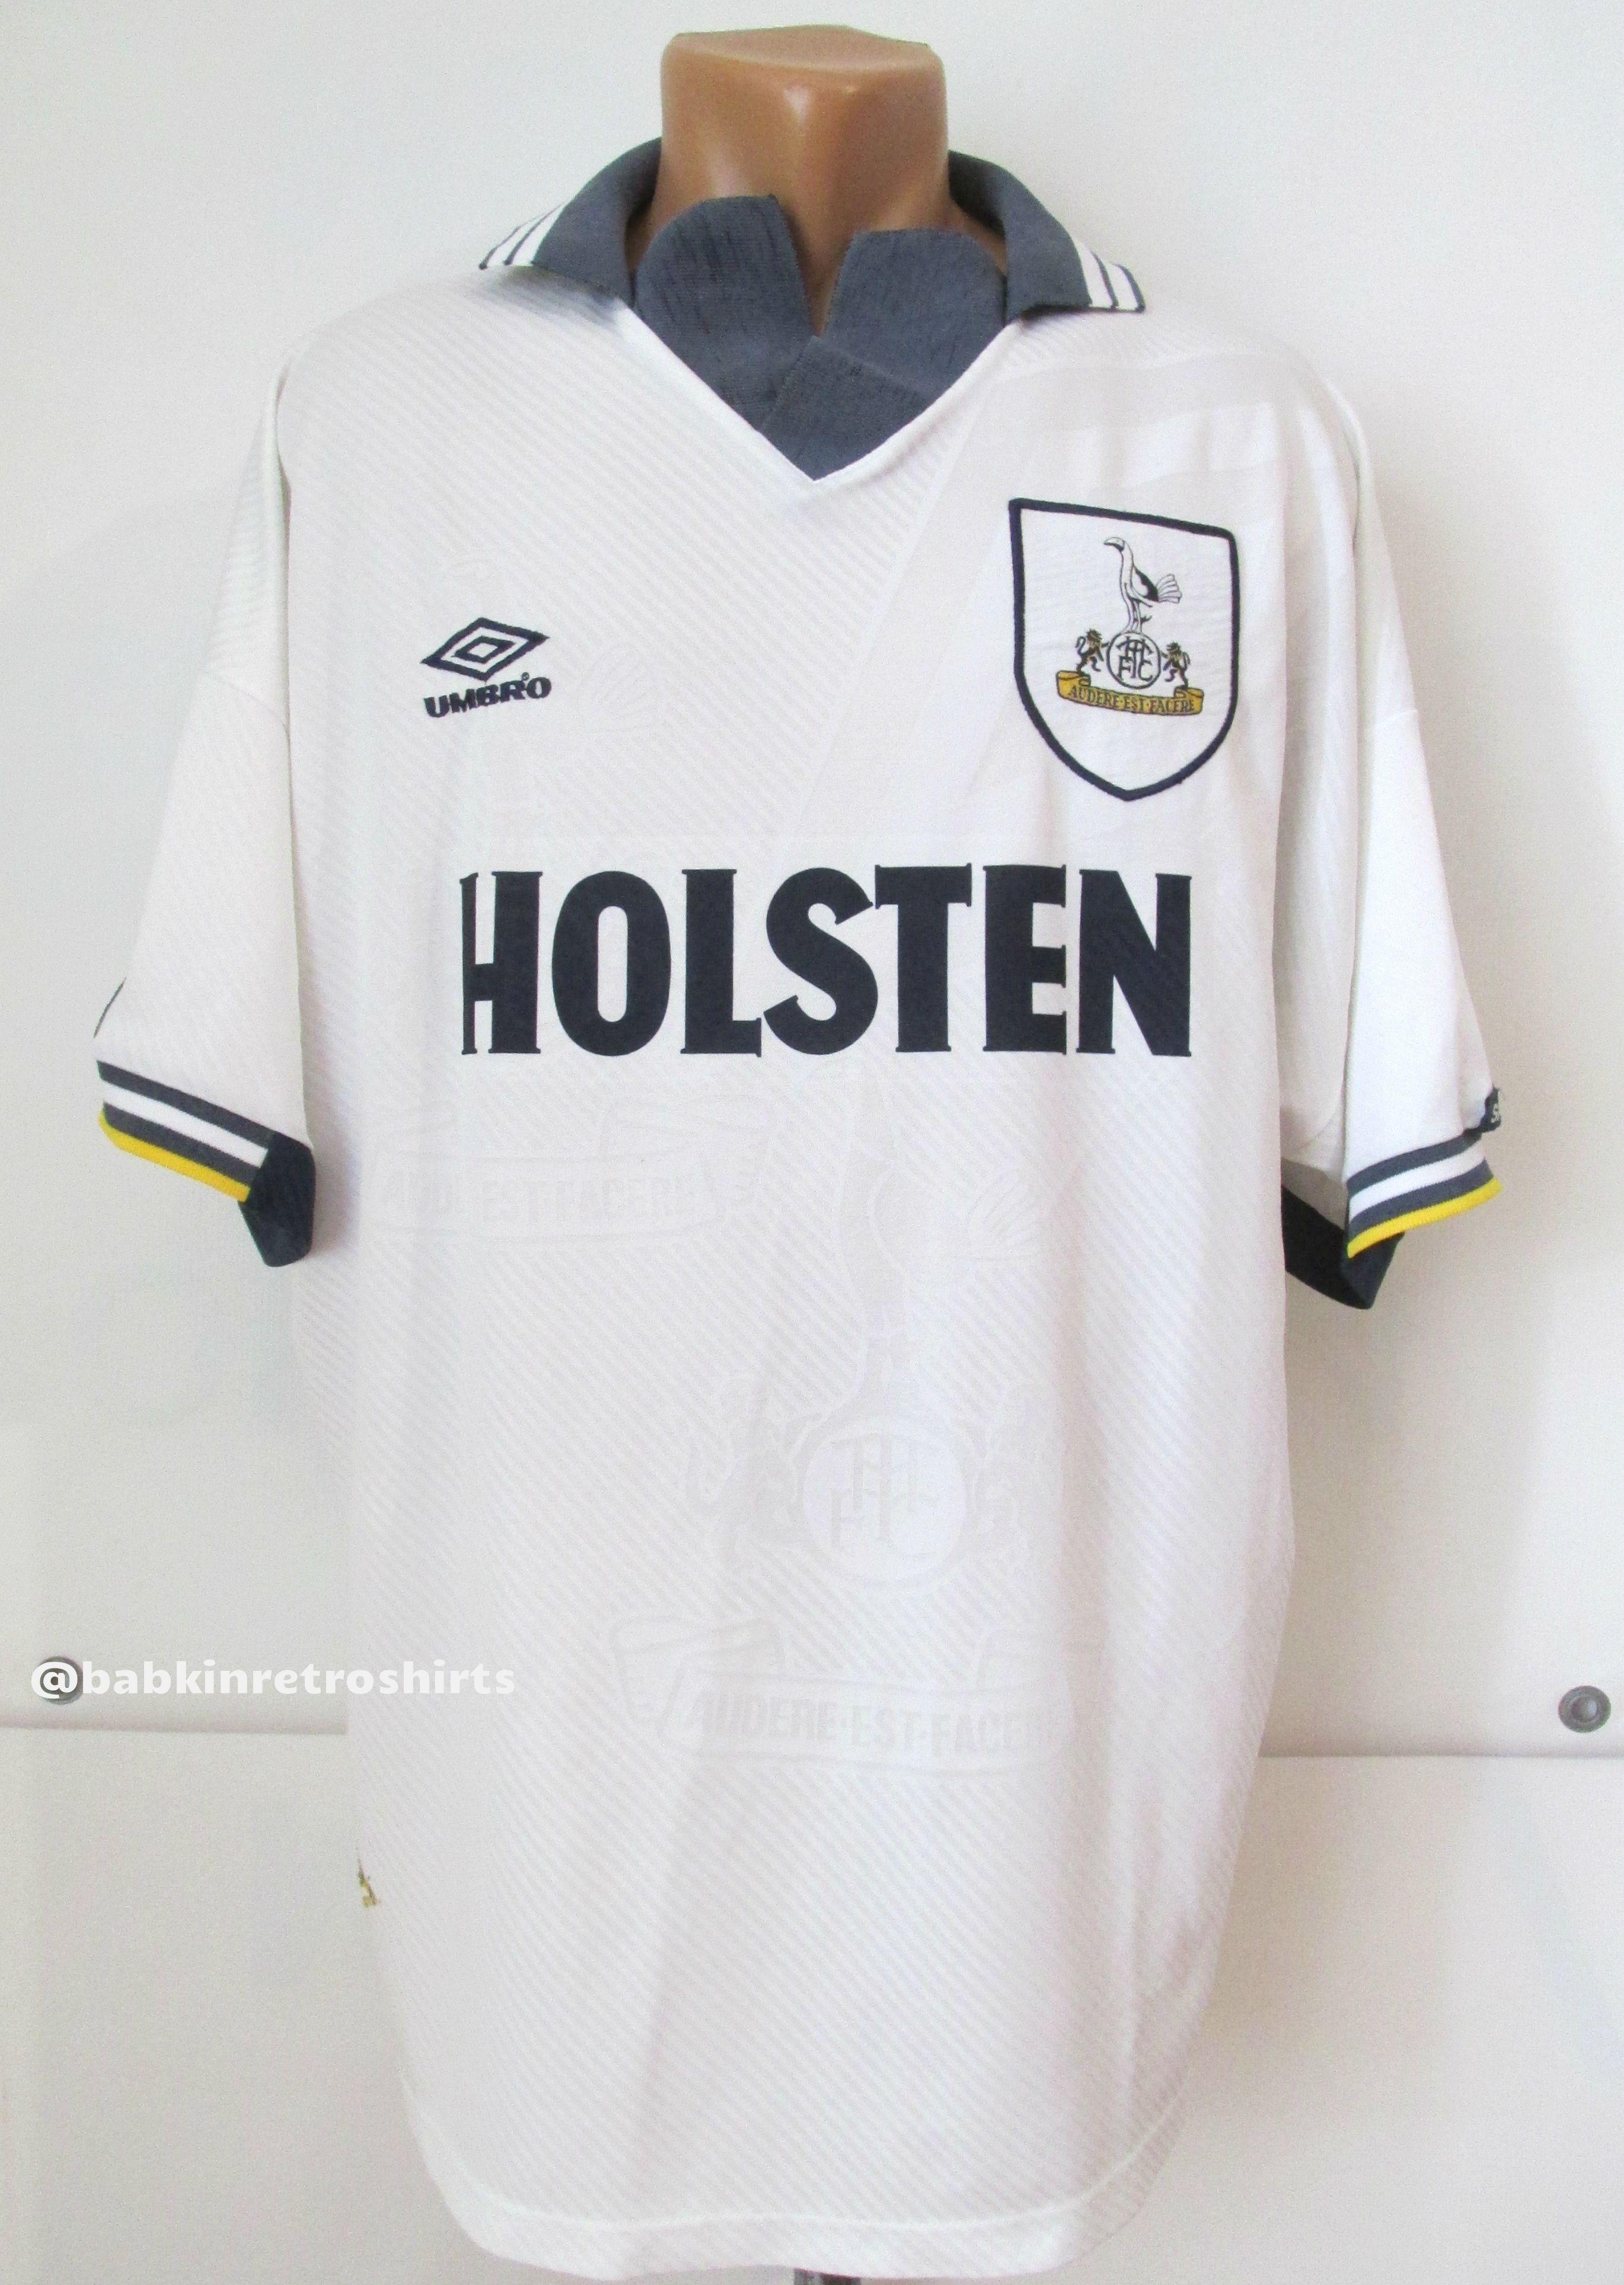 Tottenham Hotspur 1993 1994 1995 home football shirt by Umbro Spurs Holsten  retro vintage 90s jersey  jersey  football  soccer  white  umbro  tottenham  ... 1021bda78